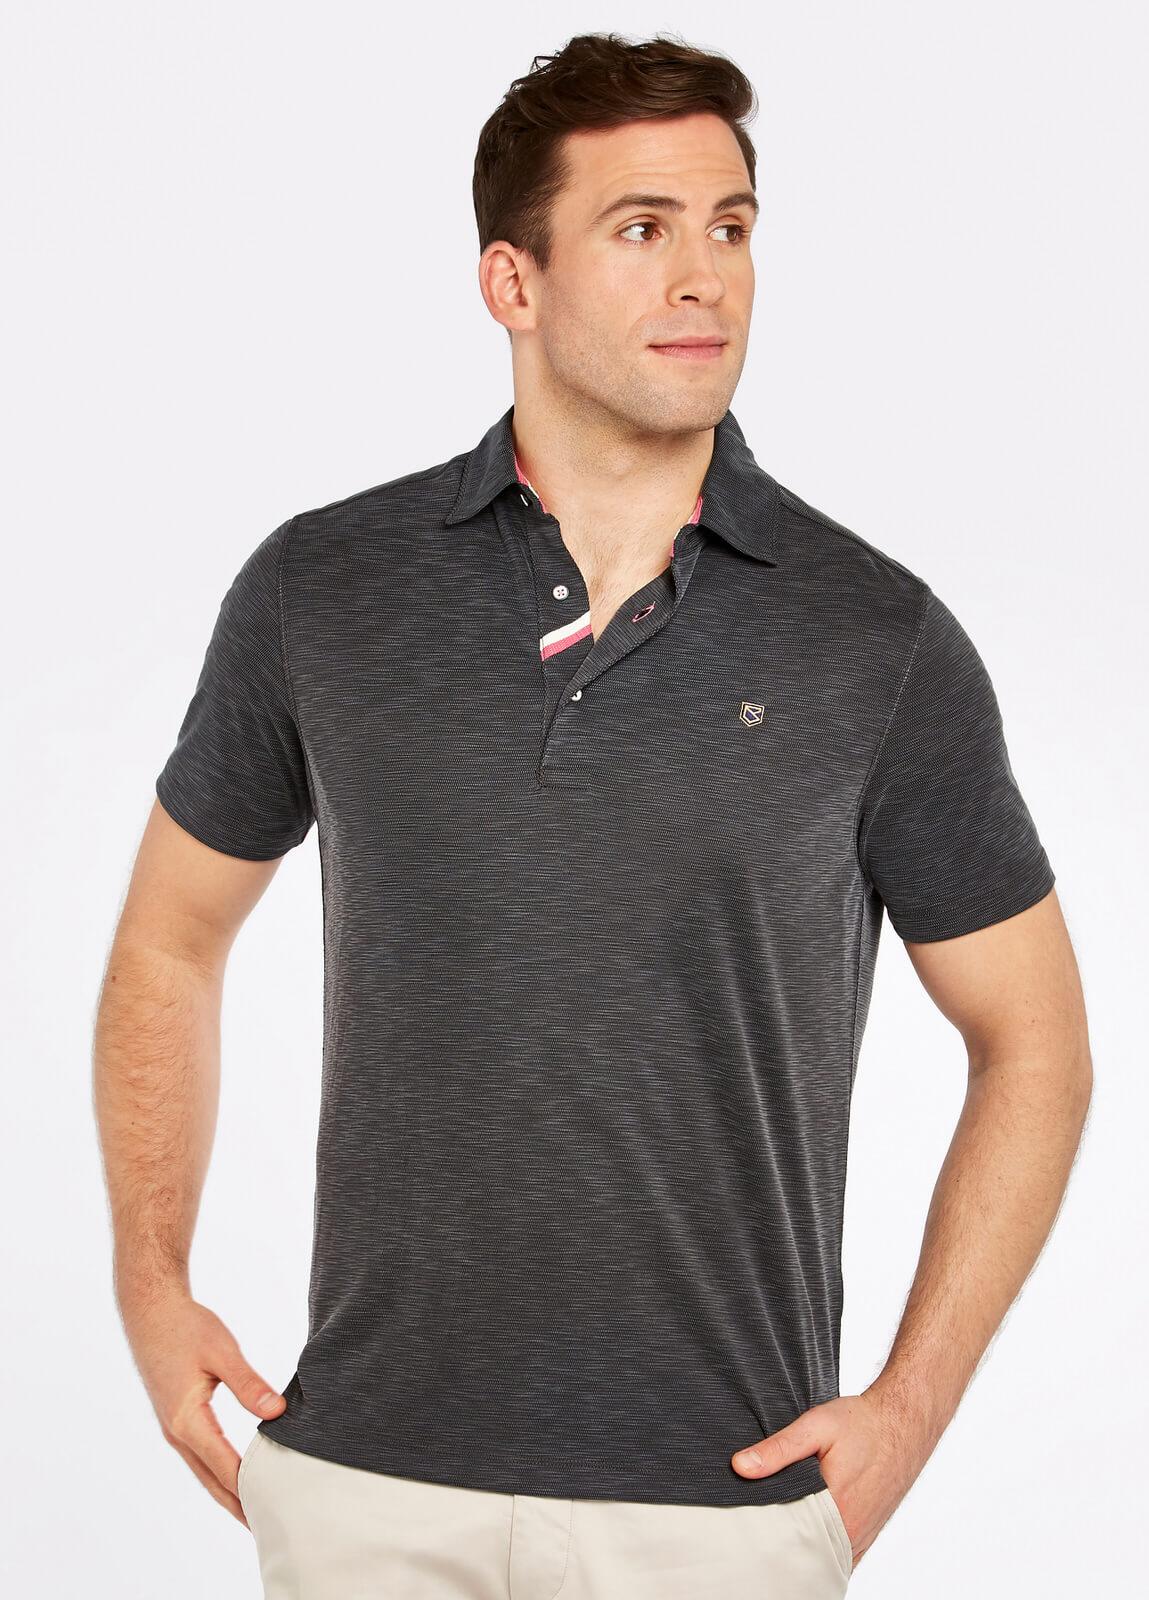 Dubarry_Corbally_Polo_Shirt_Graphite_on_model